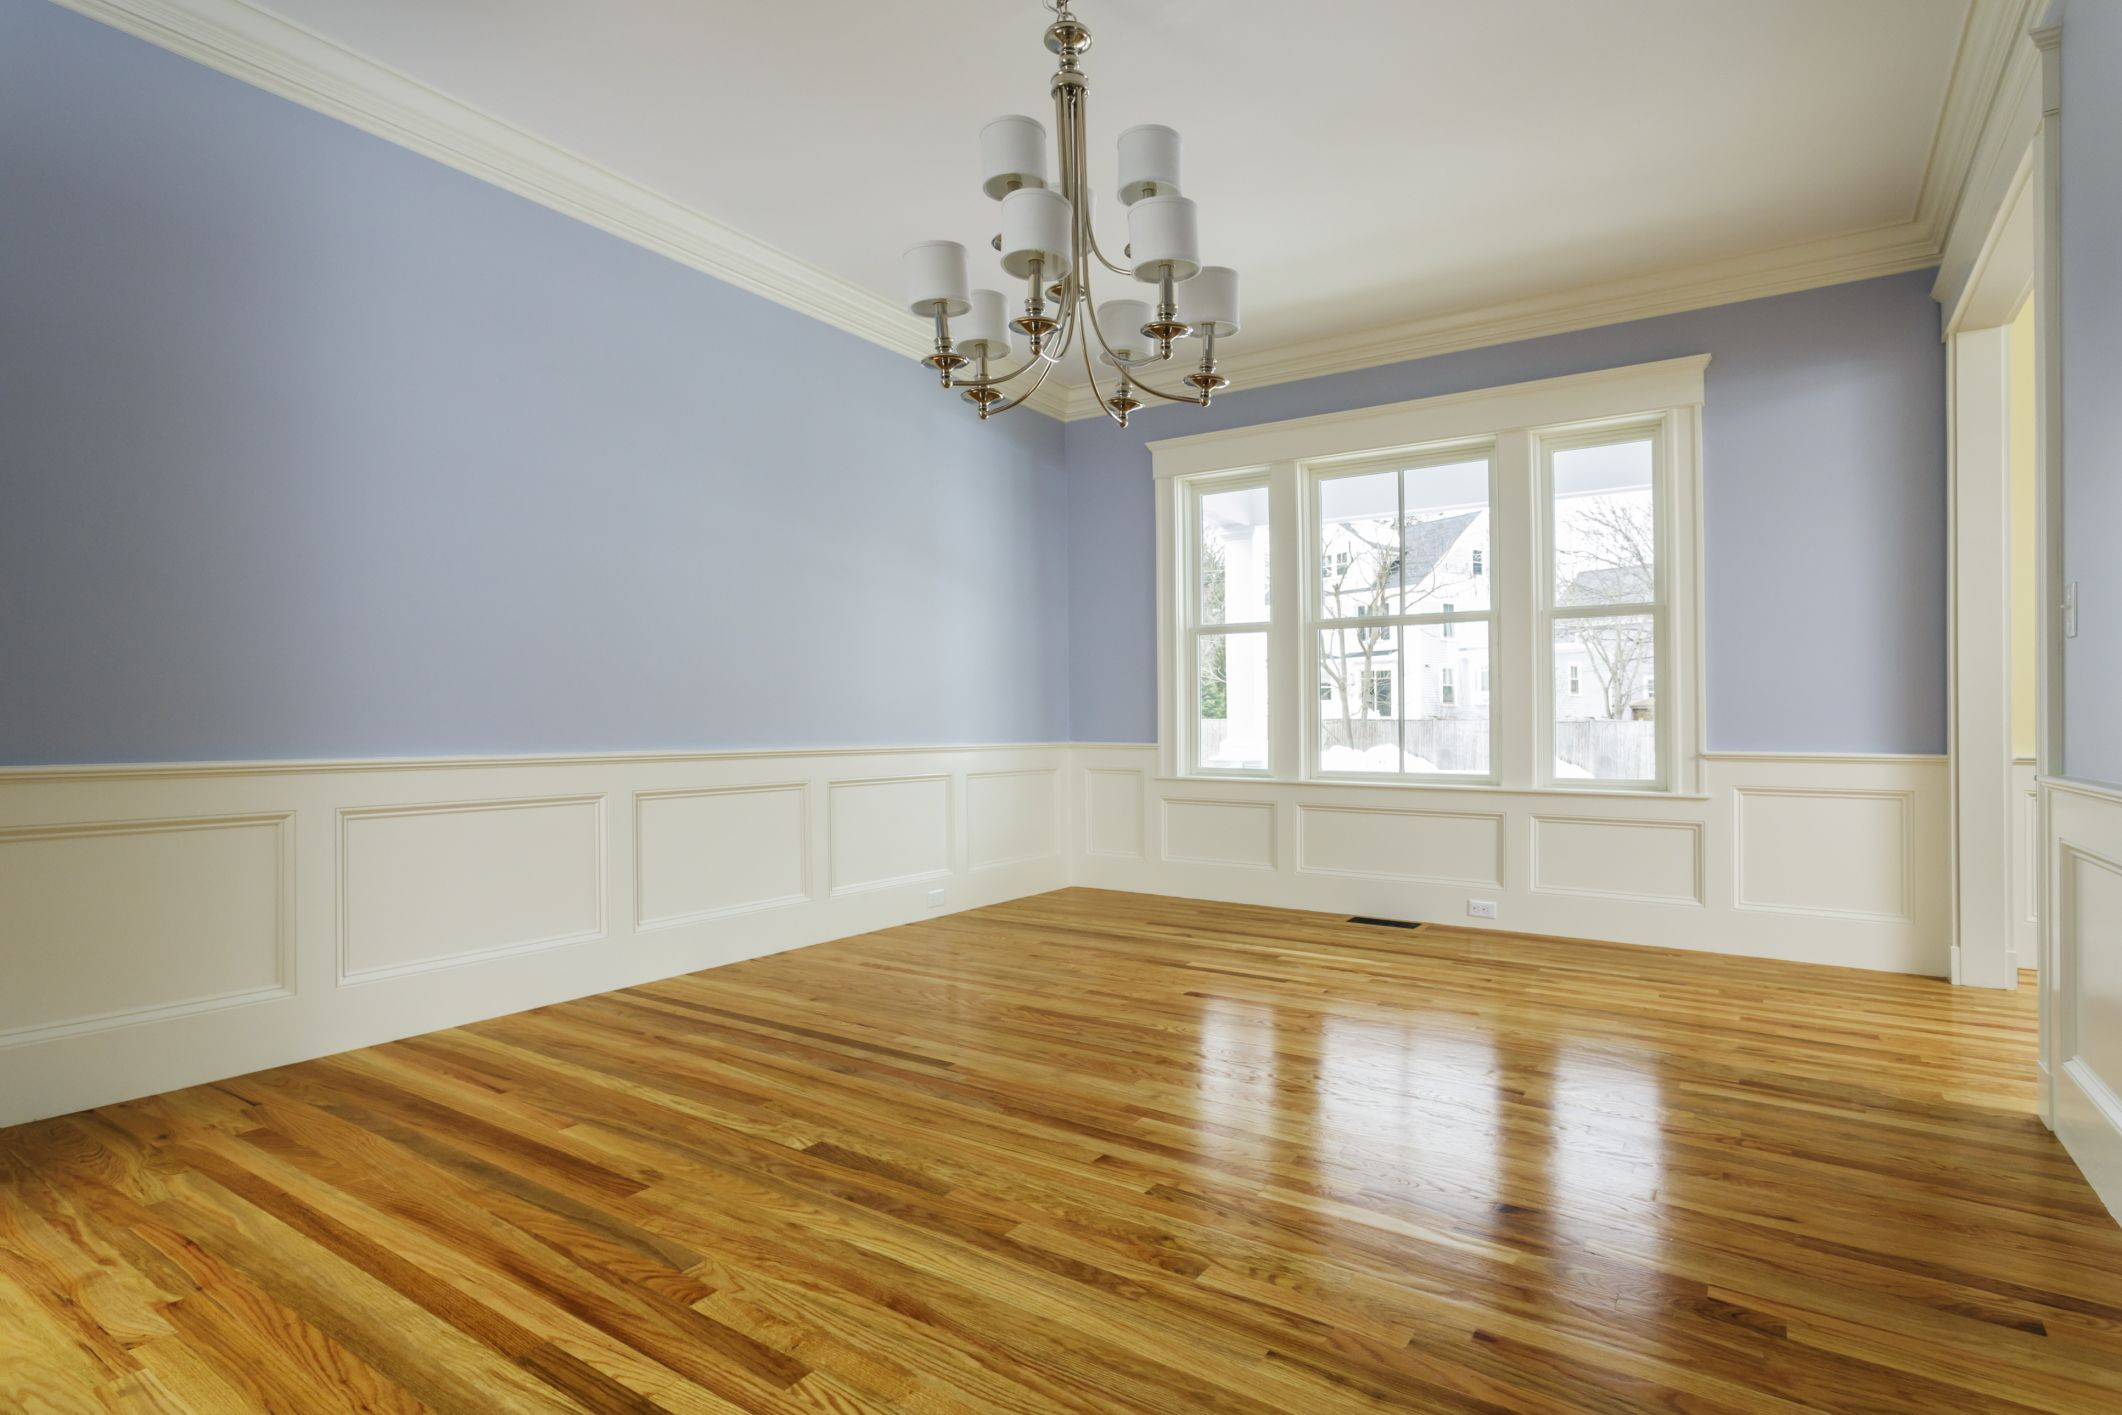 hardwood floor repair water damage of the cost to refinish hardwood floors in 168686572 highres 56a2fd773df78cf7727b6cb3